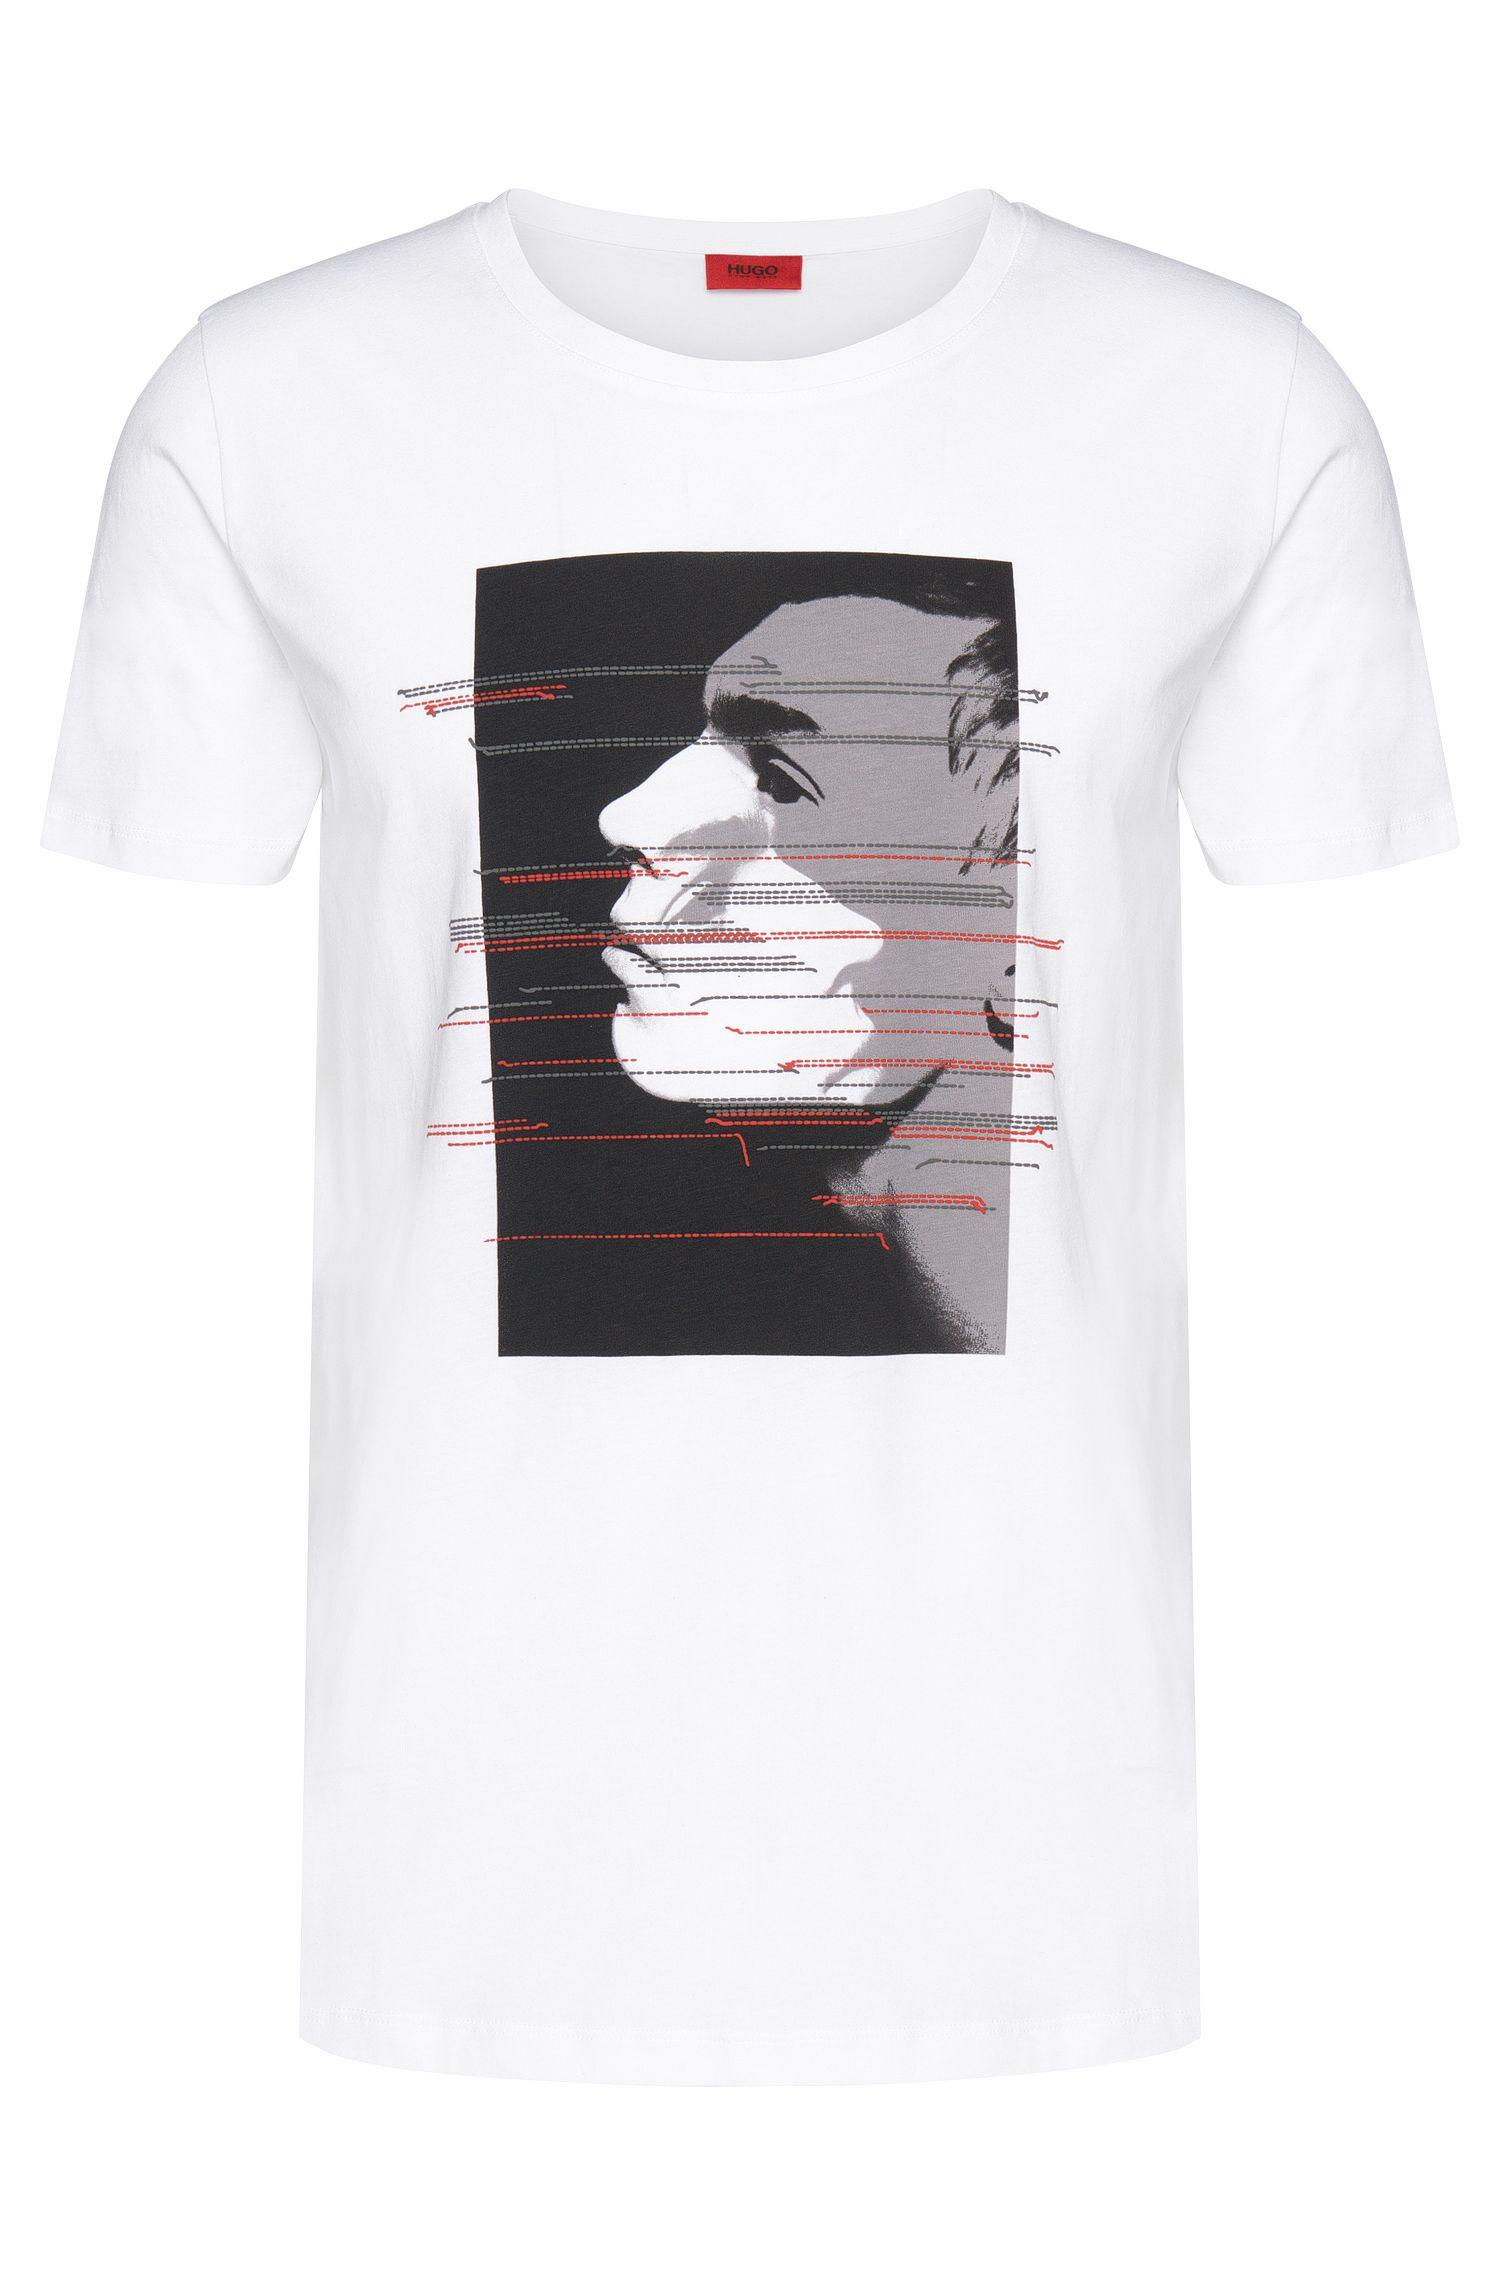 Cotton Printed Profile T-Shirt | Dashas